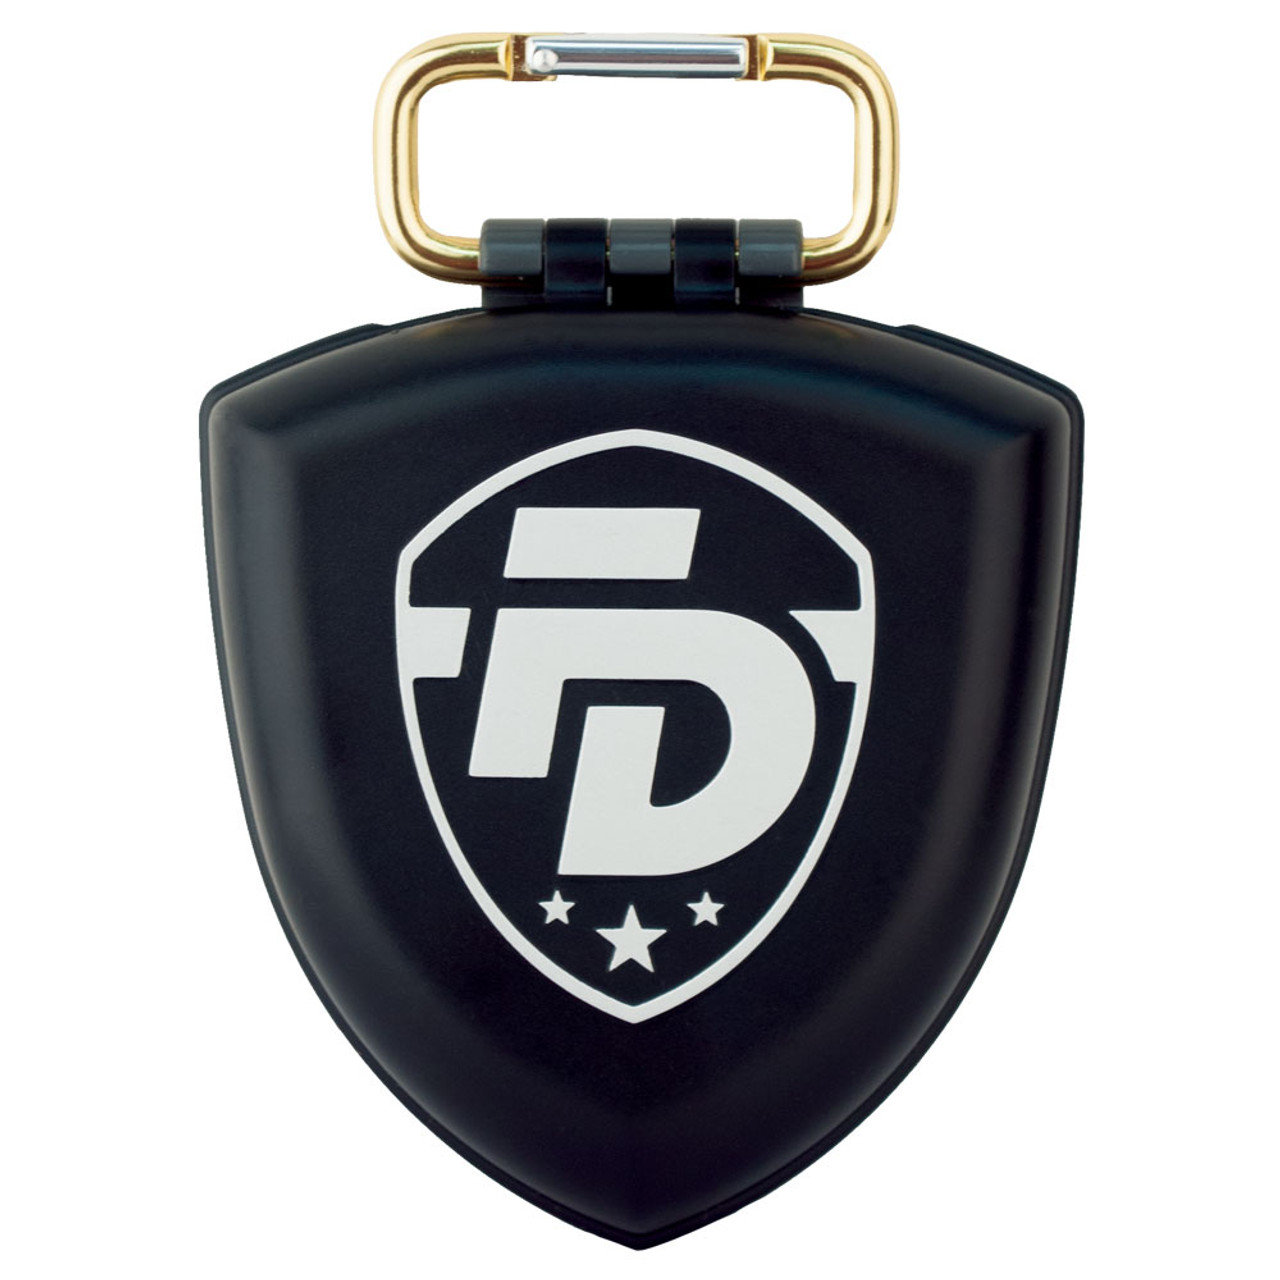 Fightdentist Shield Carry Case